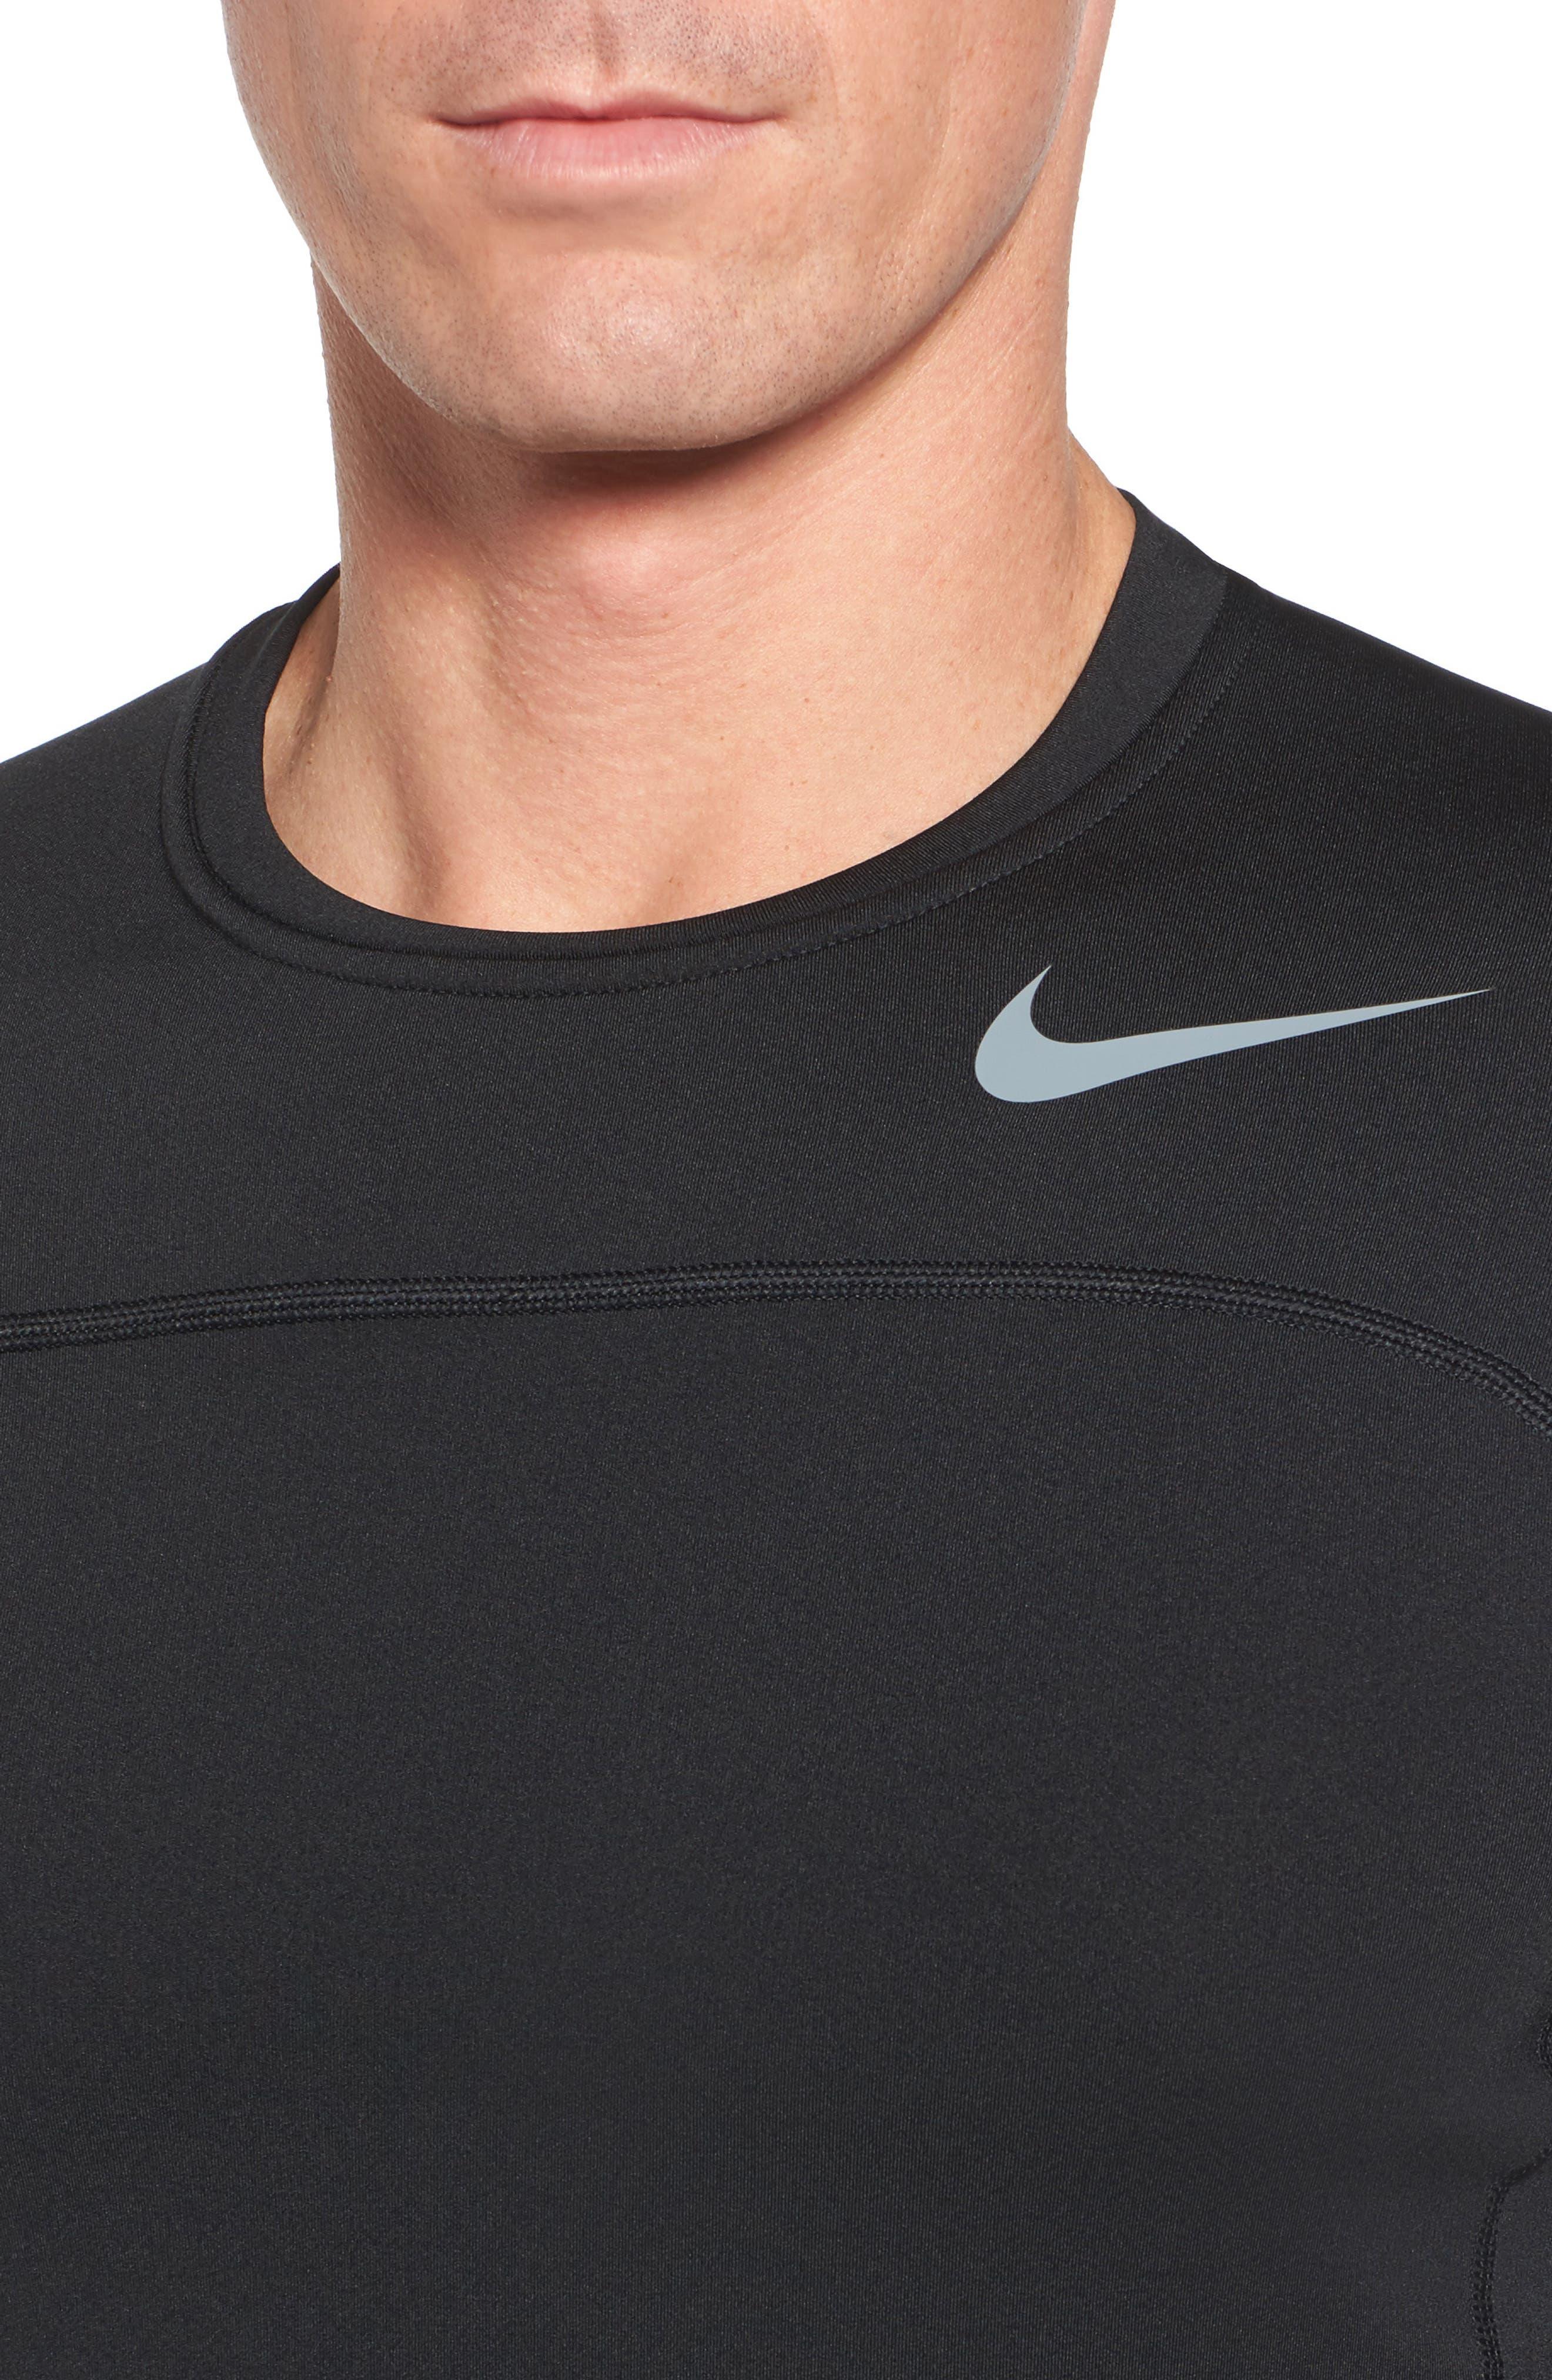 Pro Long Sleeve Training T-Shirt,                             Alternate thumbnail 4, color,                             Black/ Cool Grey/ Cool Grey